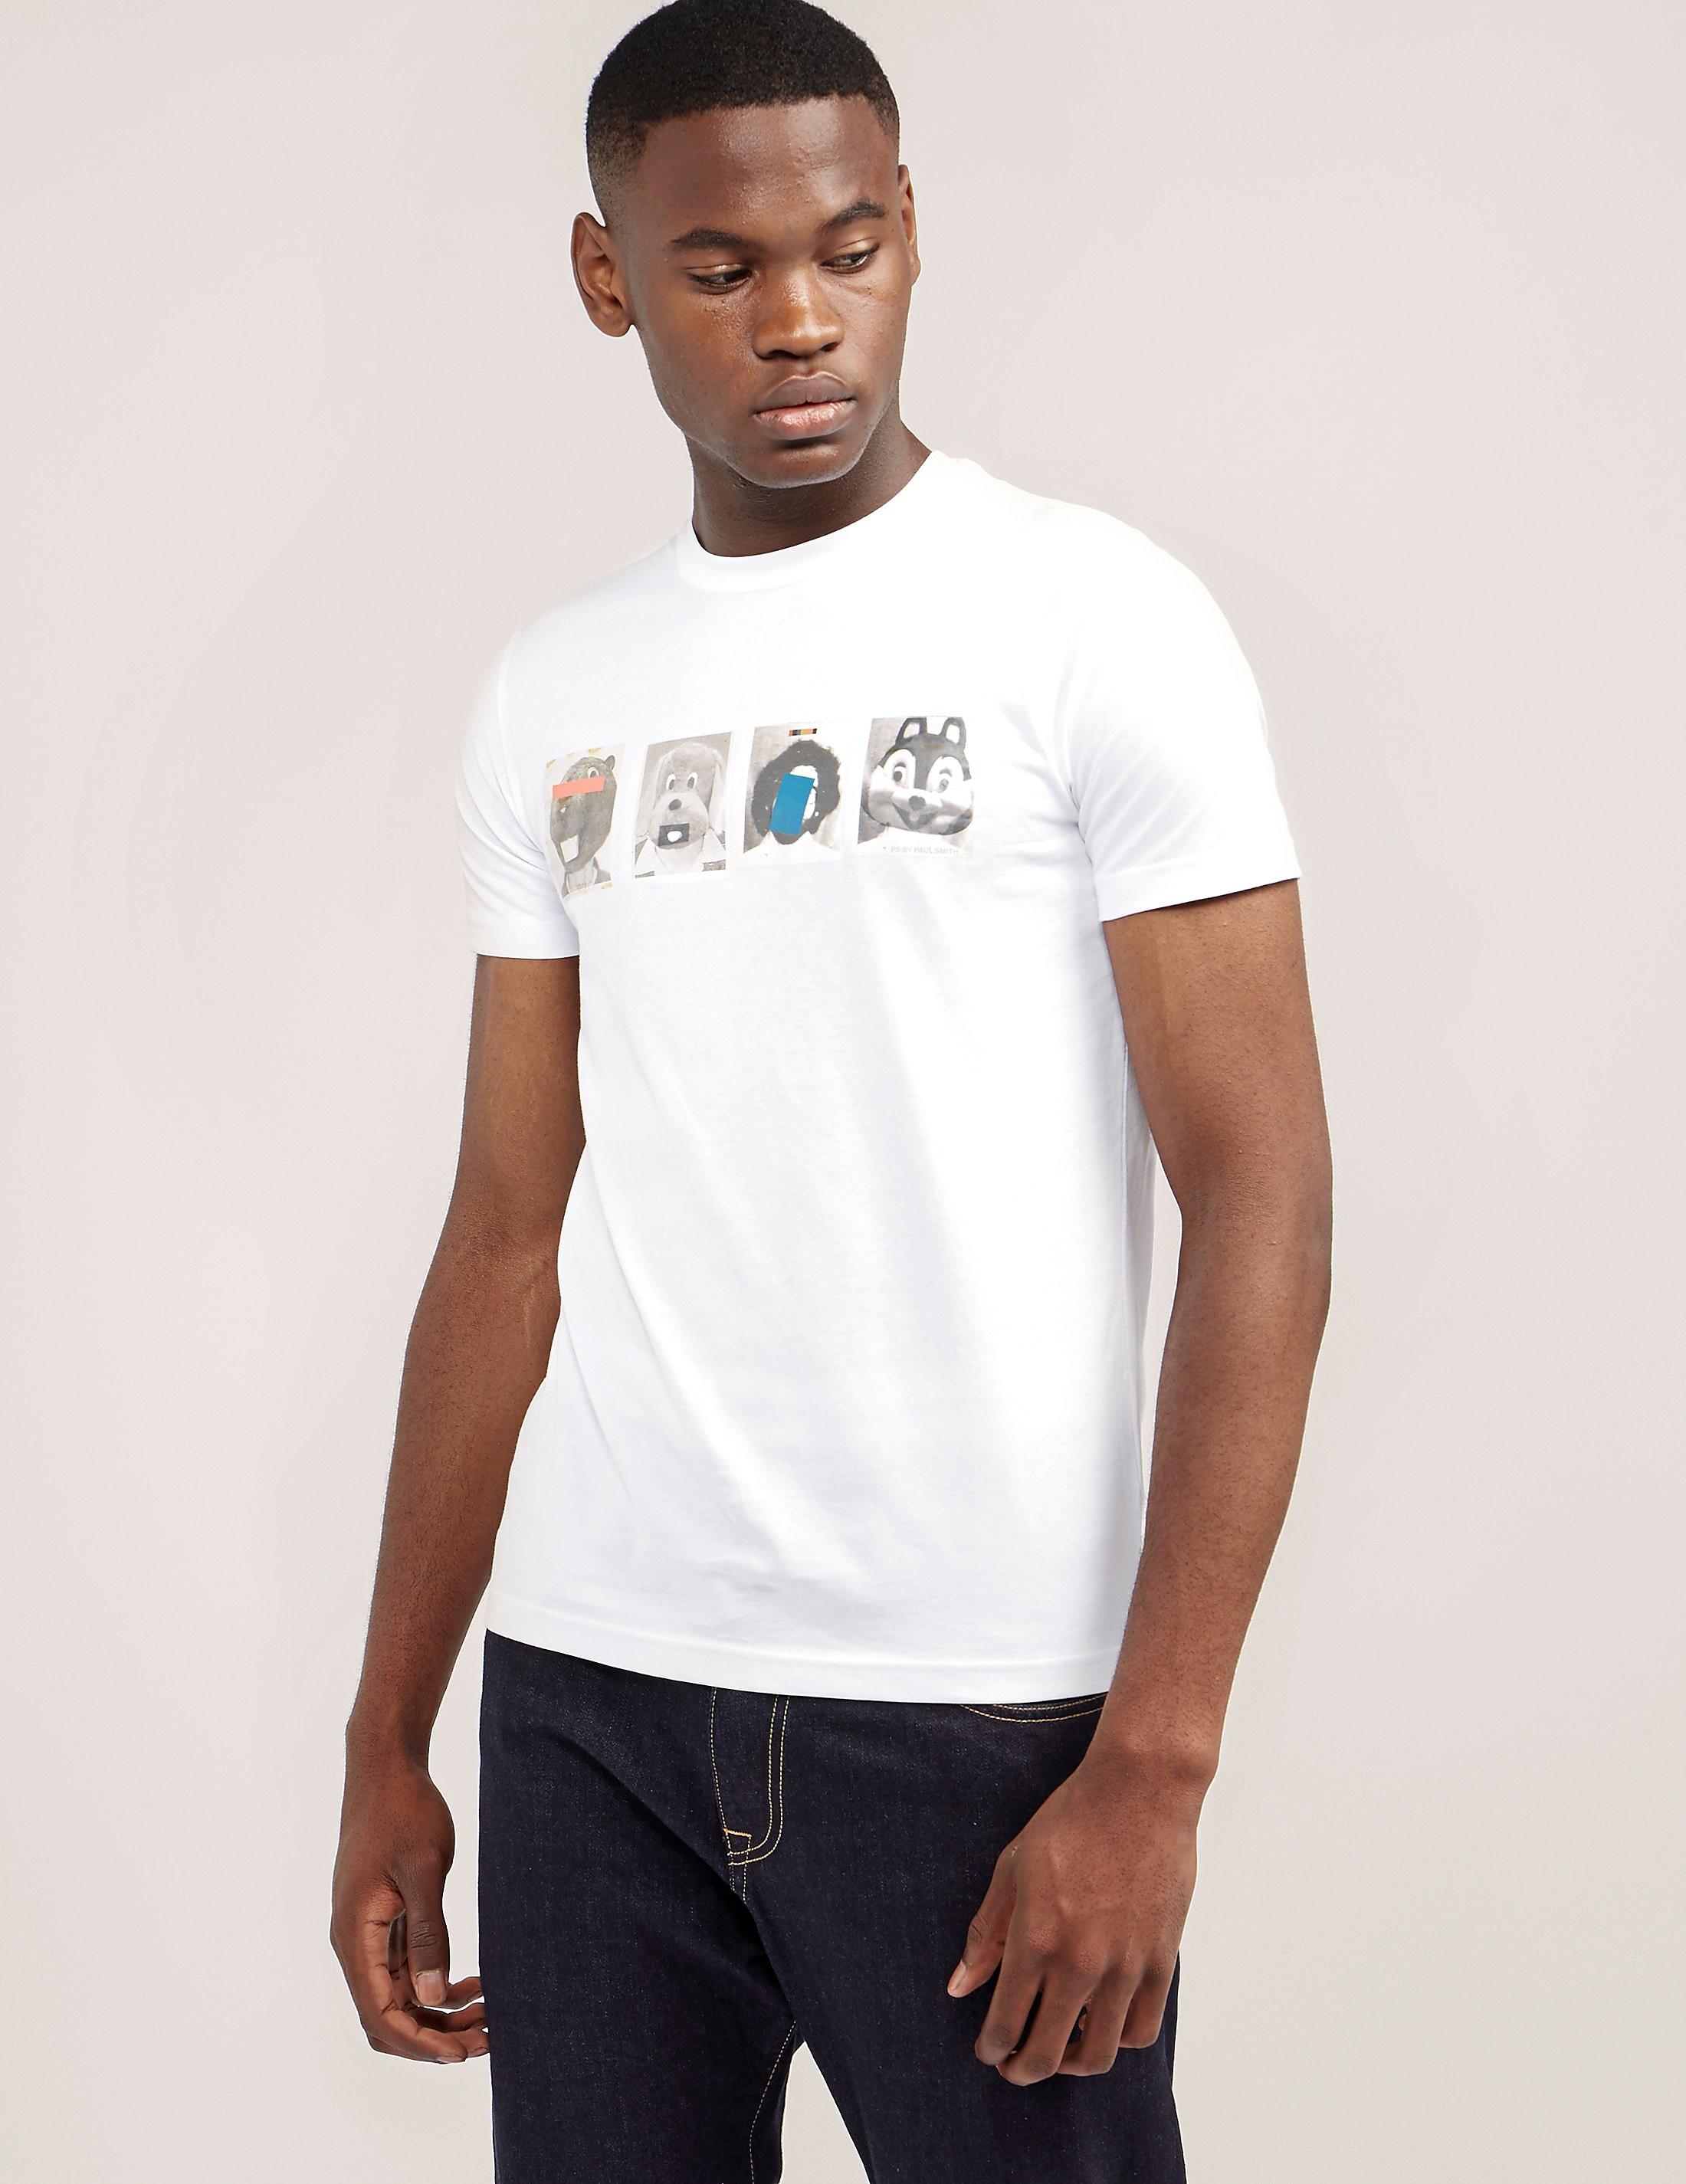 Paul Smith Mascots Print Short Sleeve T-Shirt